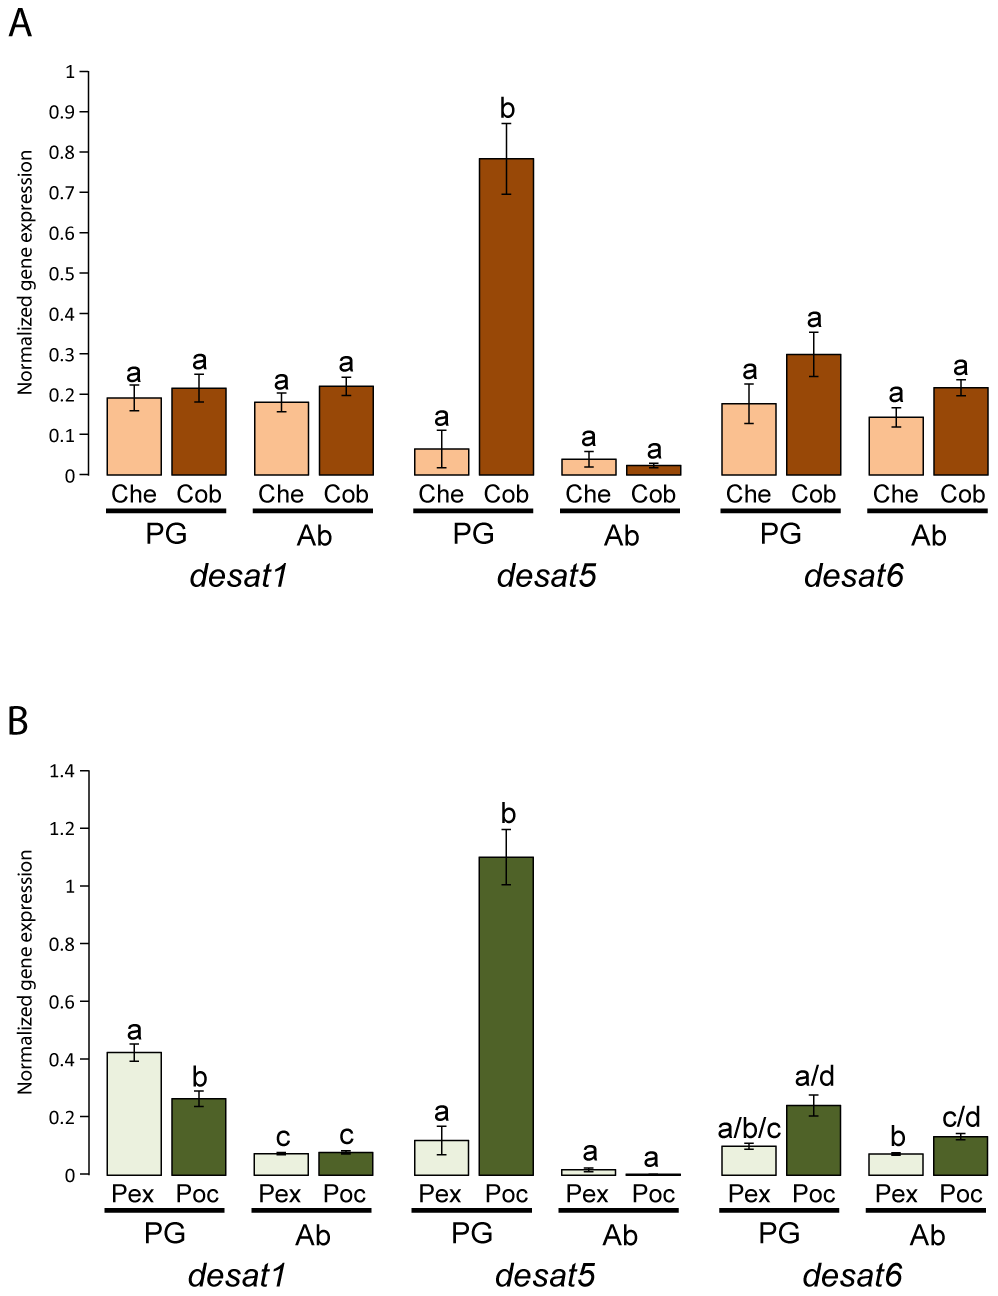 Gene expression of <i>desat1</i>, <i>desat5</i>, and <i>desat6</i> in the pheromone gland and abdomen of virgin females in <i>Ctenopseustis obliquana</i>, <i>C. herana</i>, <i>P. excessana</i>, and <i>P. octo</i> relative to housekeeper genes.